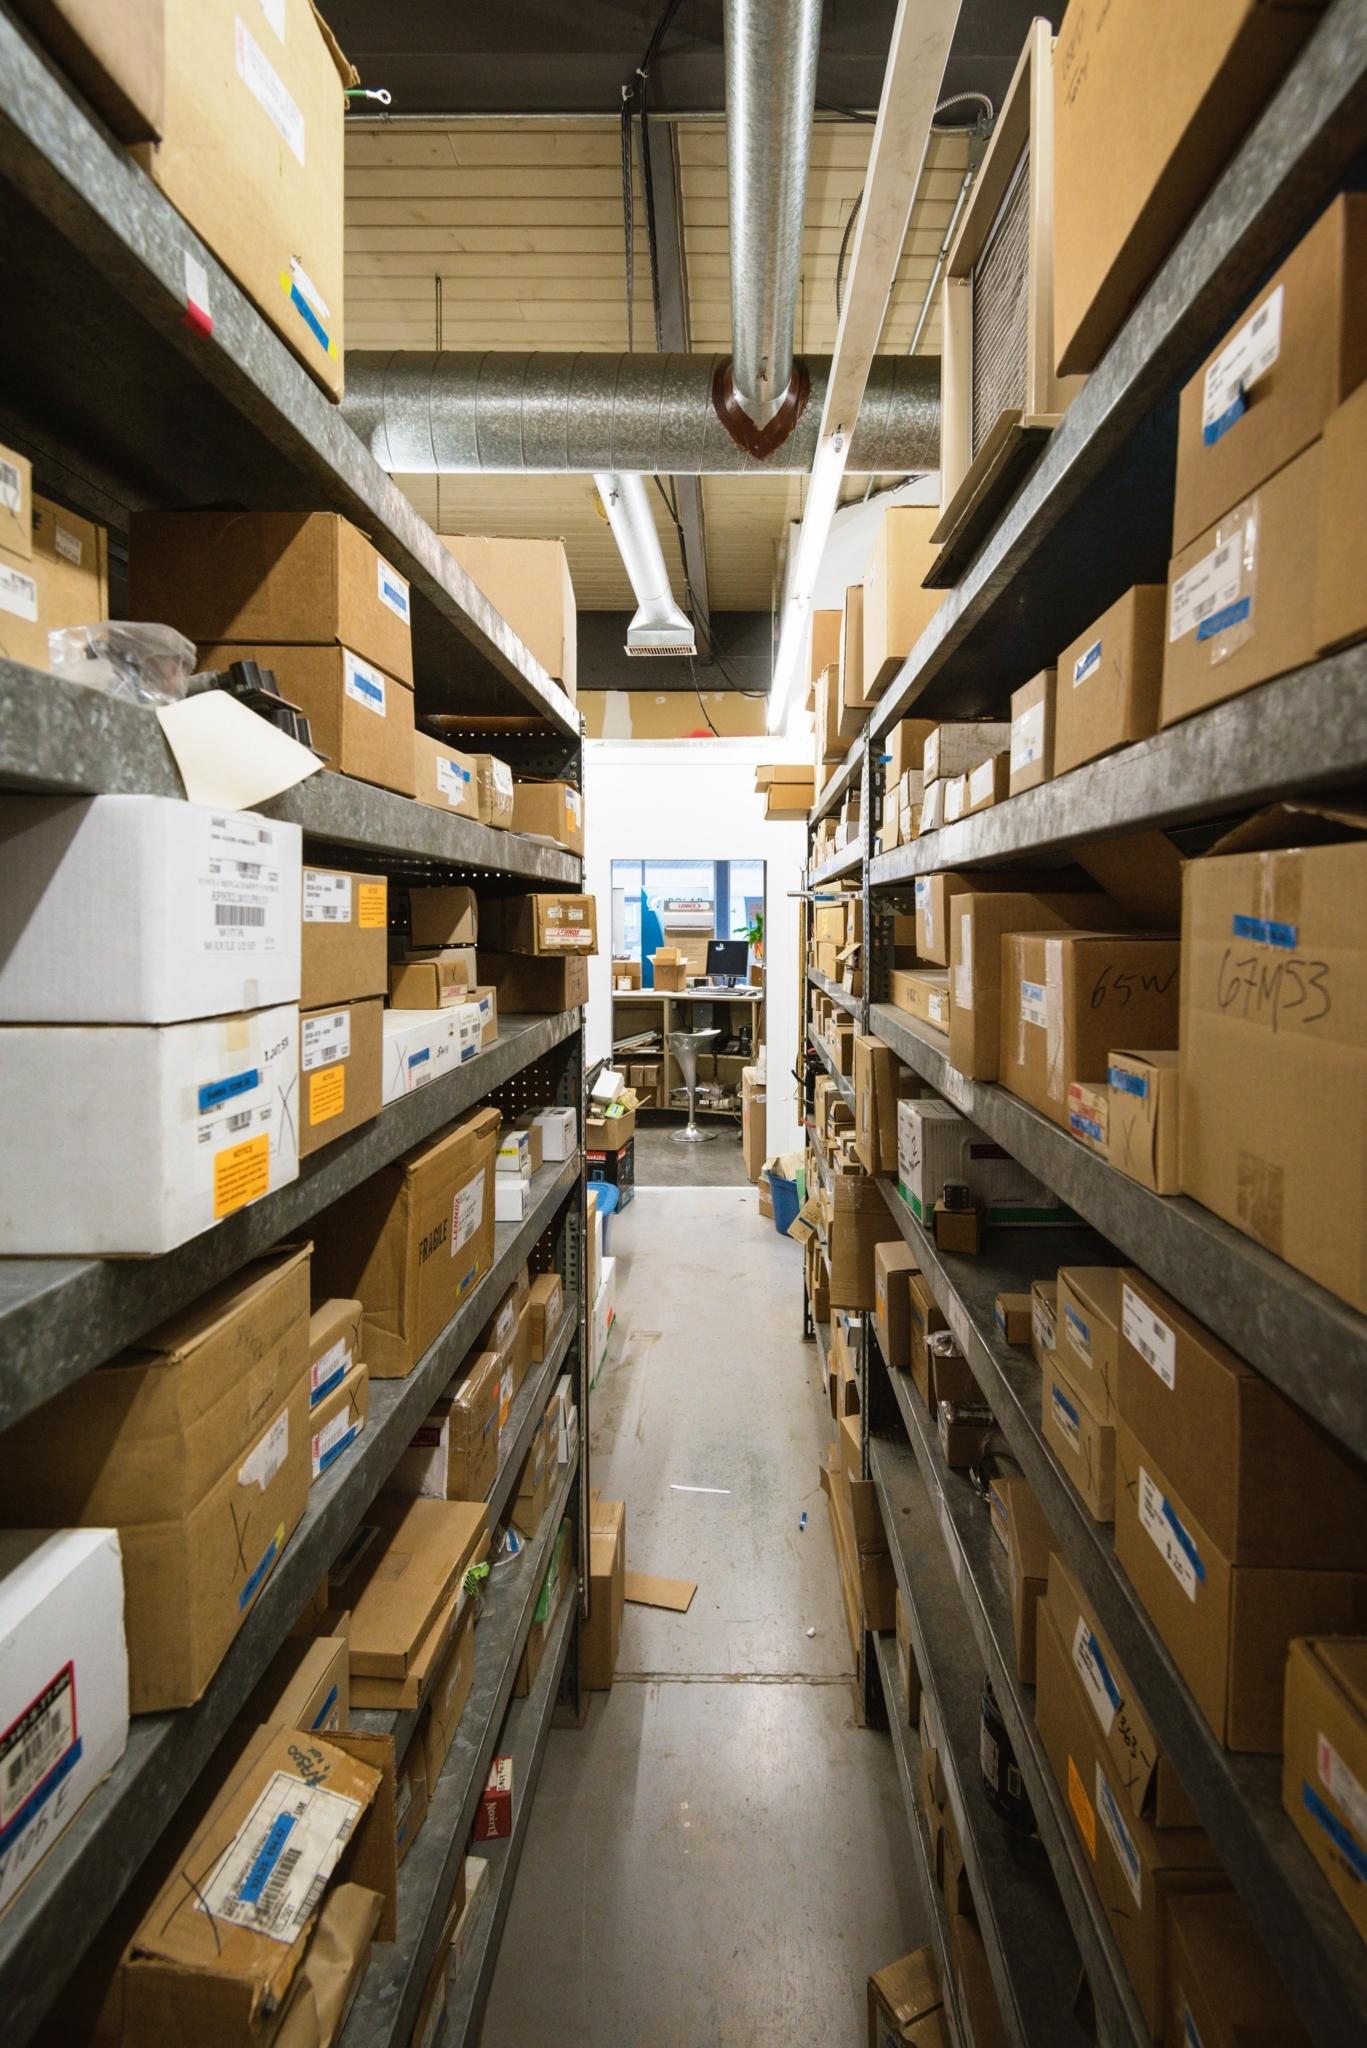 Polar Refrigeration Sales & Service Ltd in Prince George